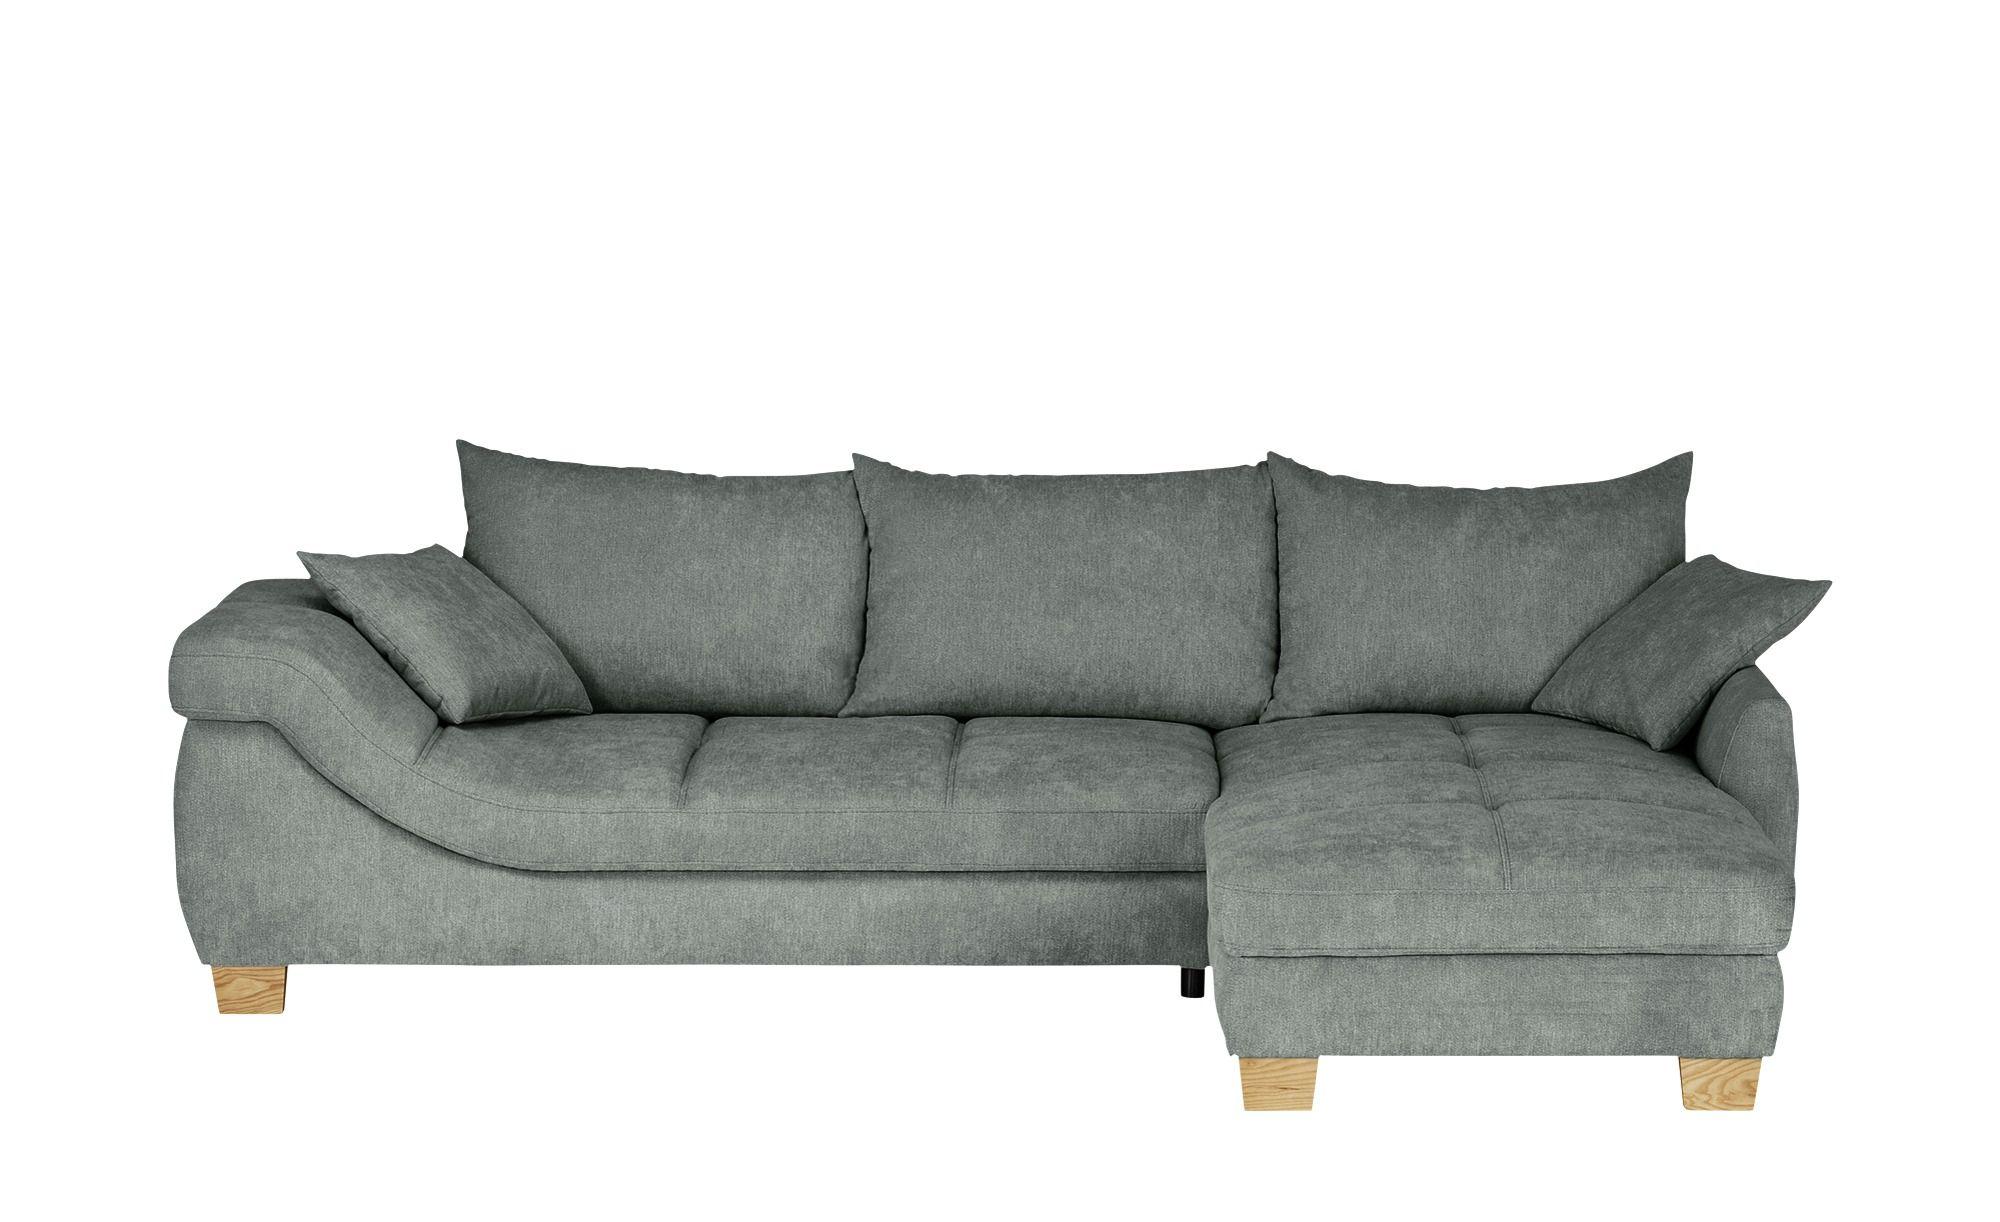 Billigt Sofa Sofas Gunstige Chesterfield Sofa Second Hand